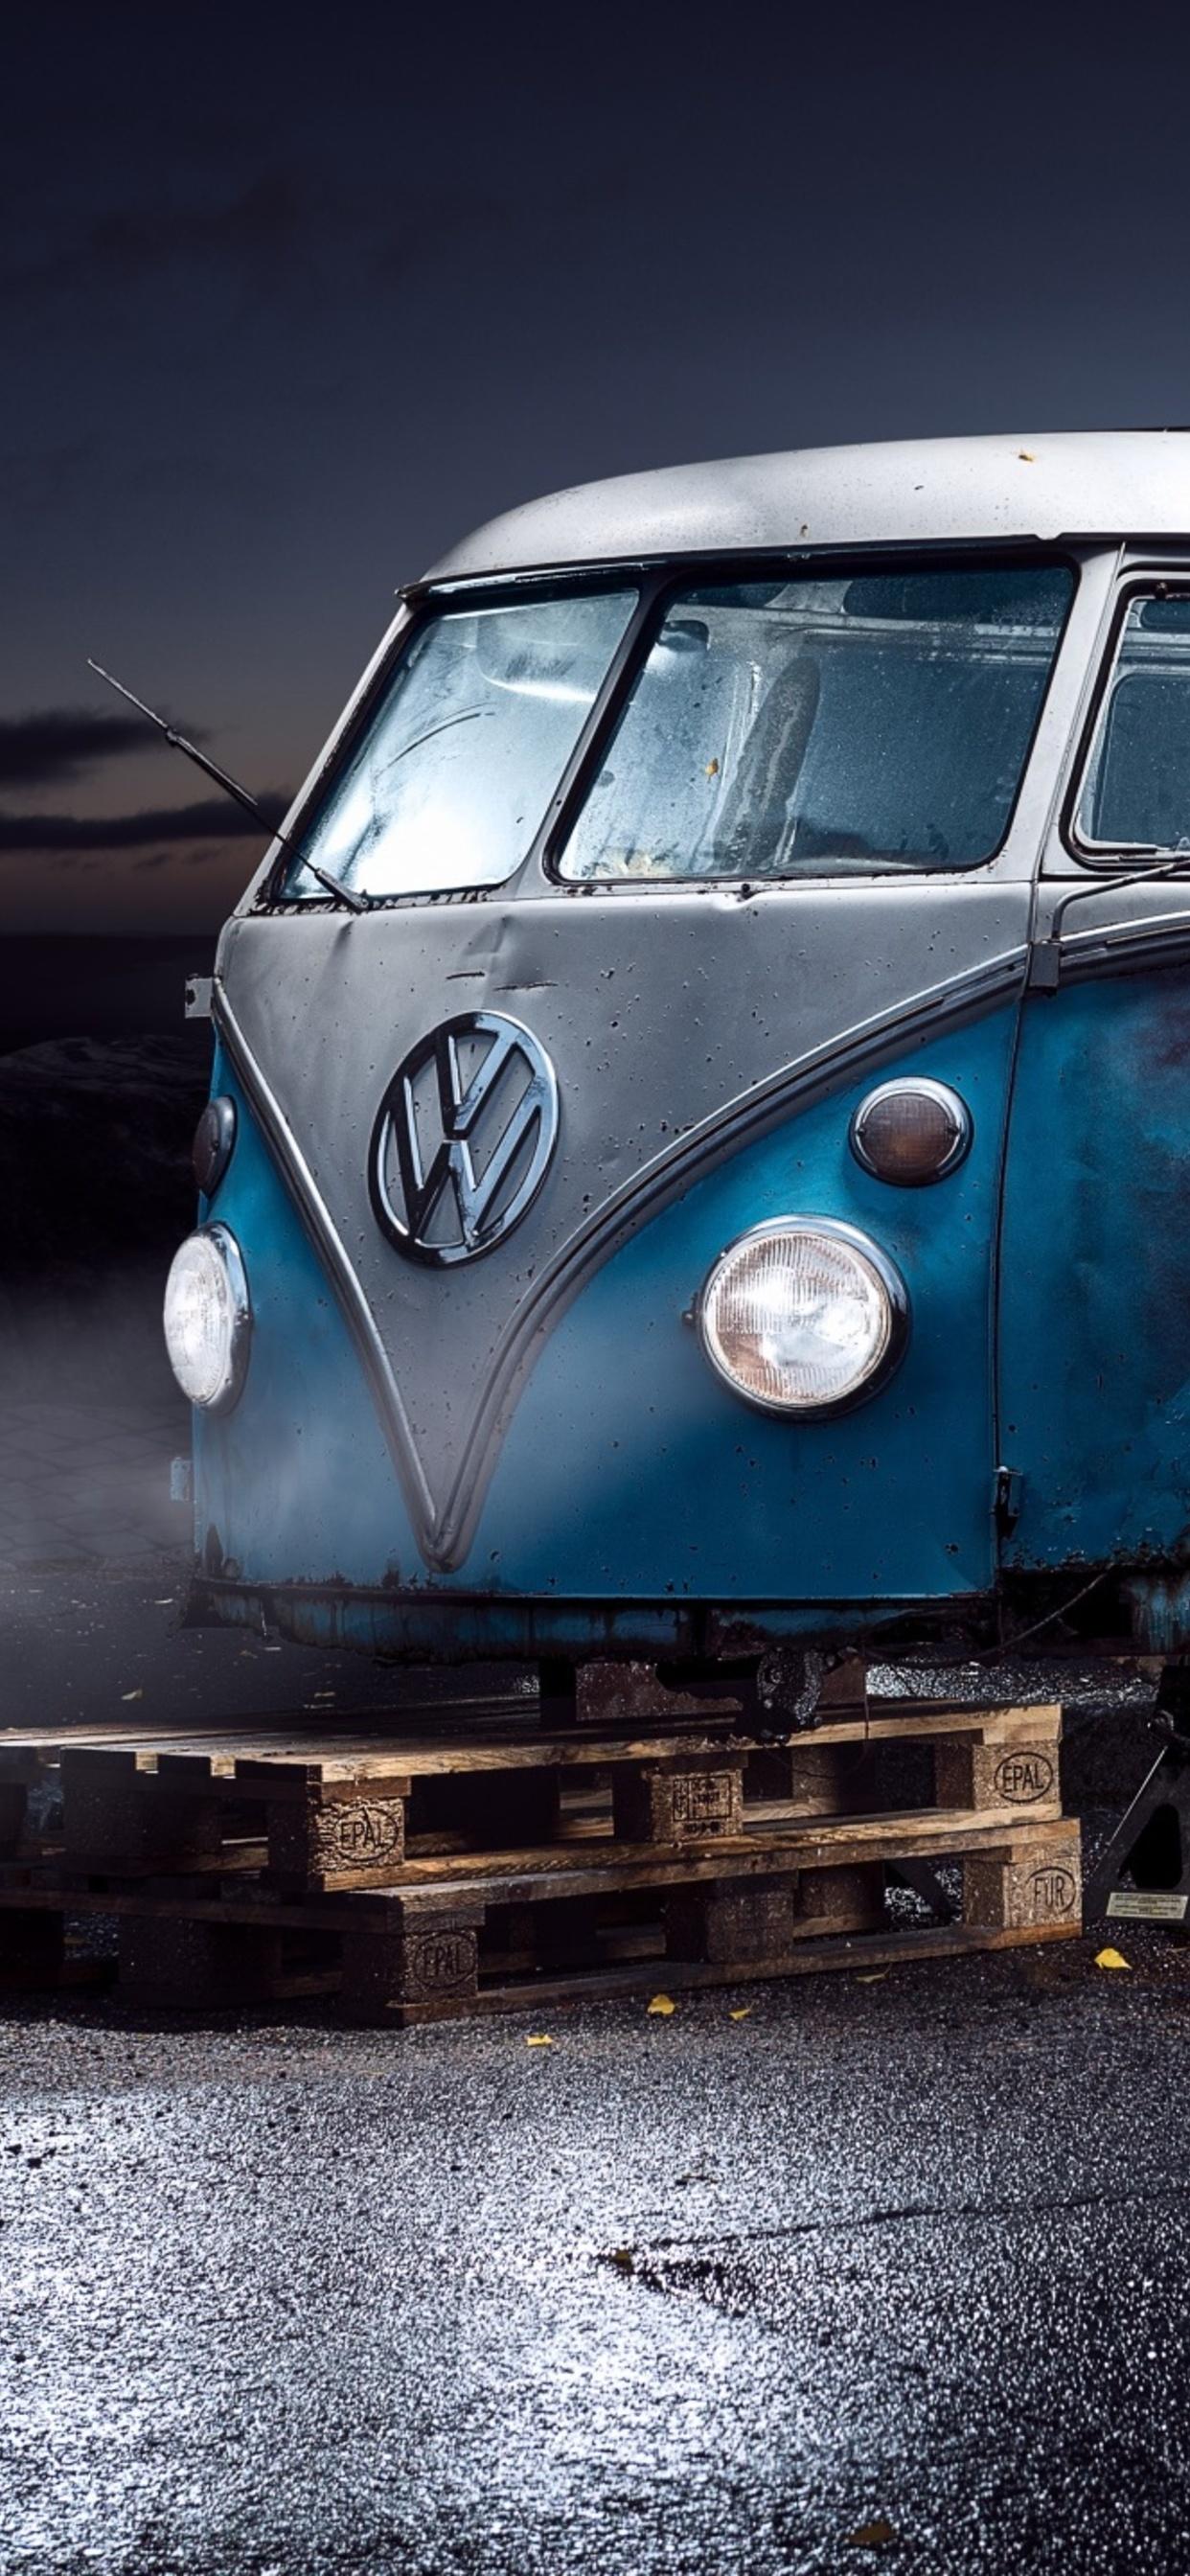 1242x2688 Volkswagen Van Tyre Repair Iphone Xs Max Hd 4k Wallpapers Images Backgrounds Photos And Pictures